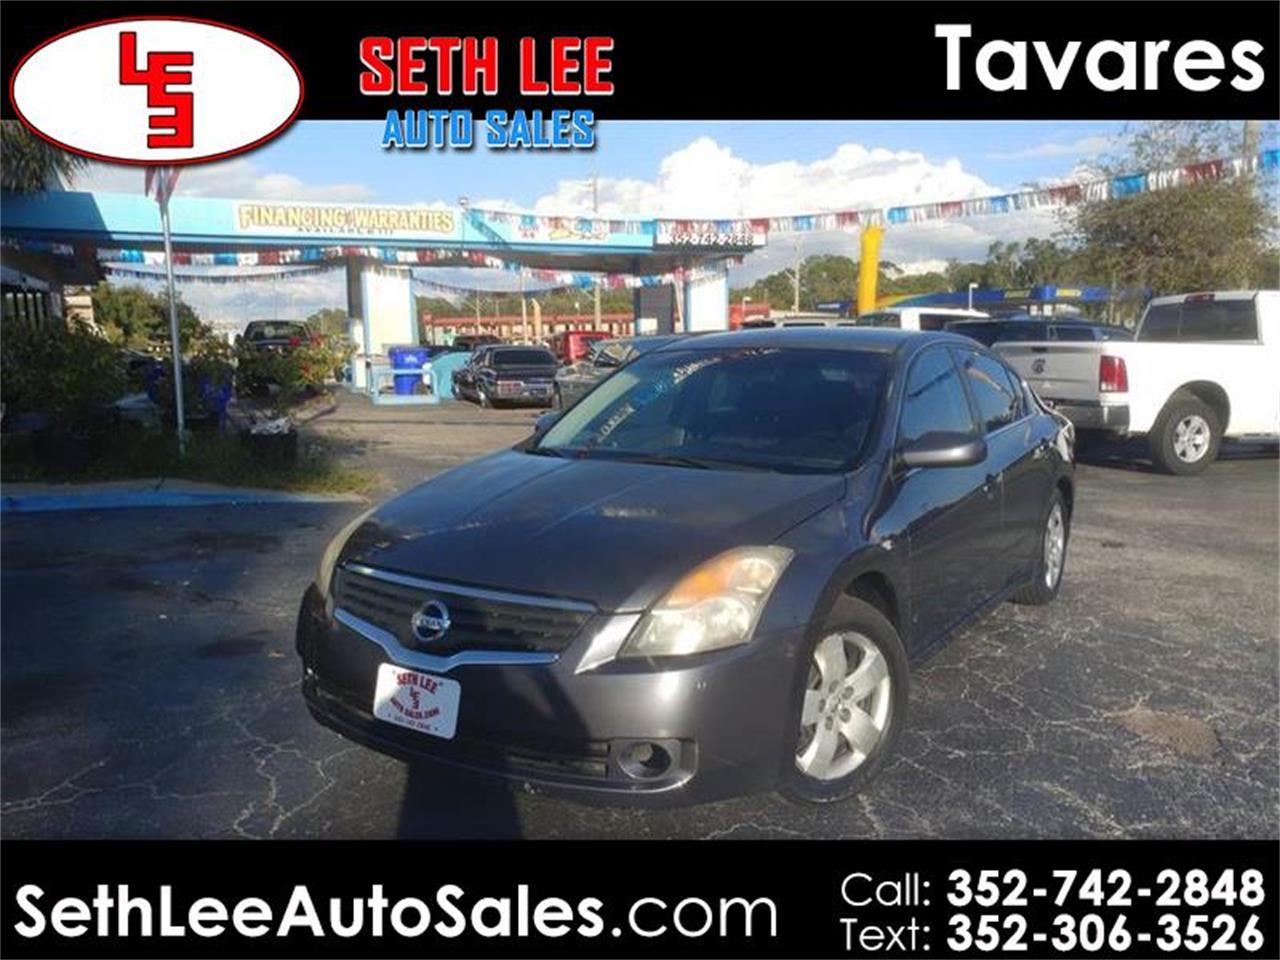 2008 Nissan Altima For Sale >> For Sale 2008 Nissan Altima In Tavares Florida